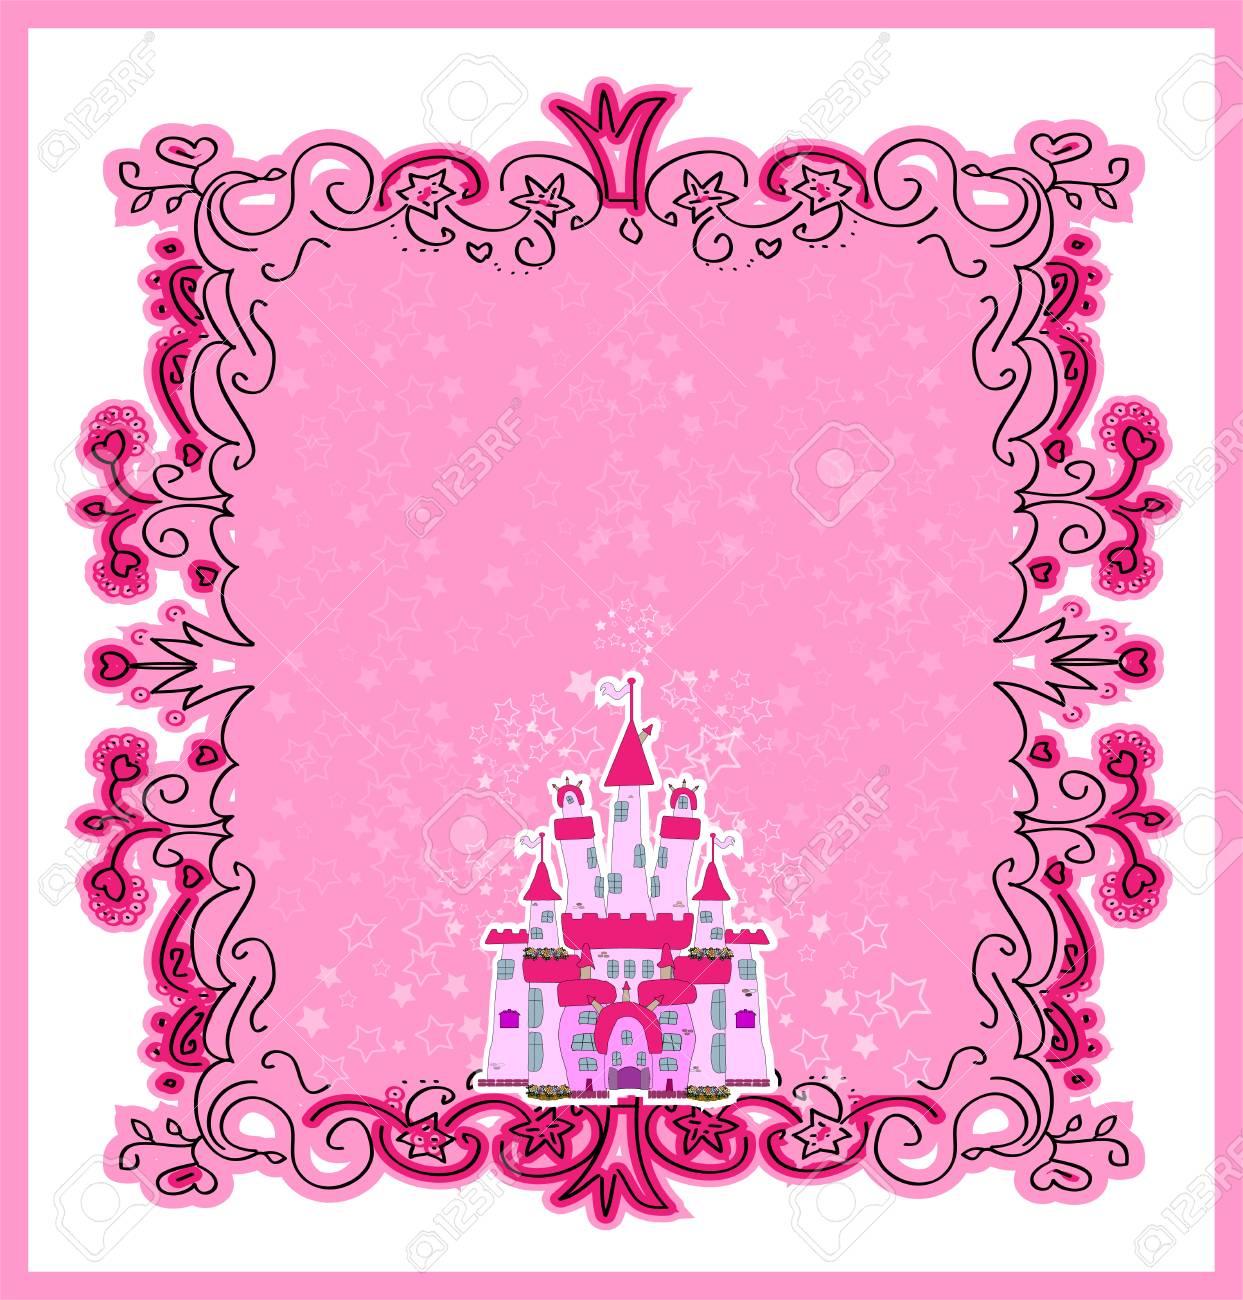 Illustration of Magic Fairy Tale  Princess Castle Stock Vector - 22857371